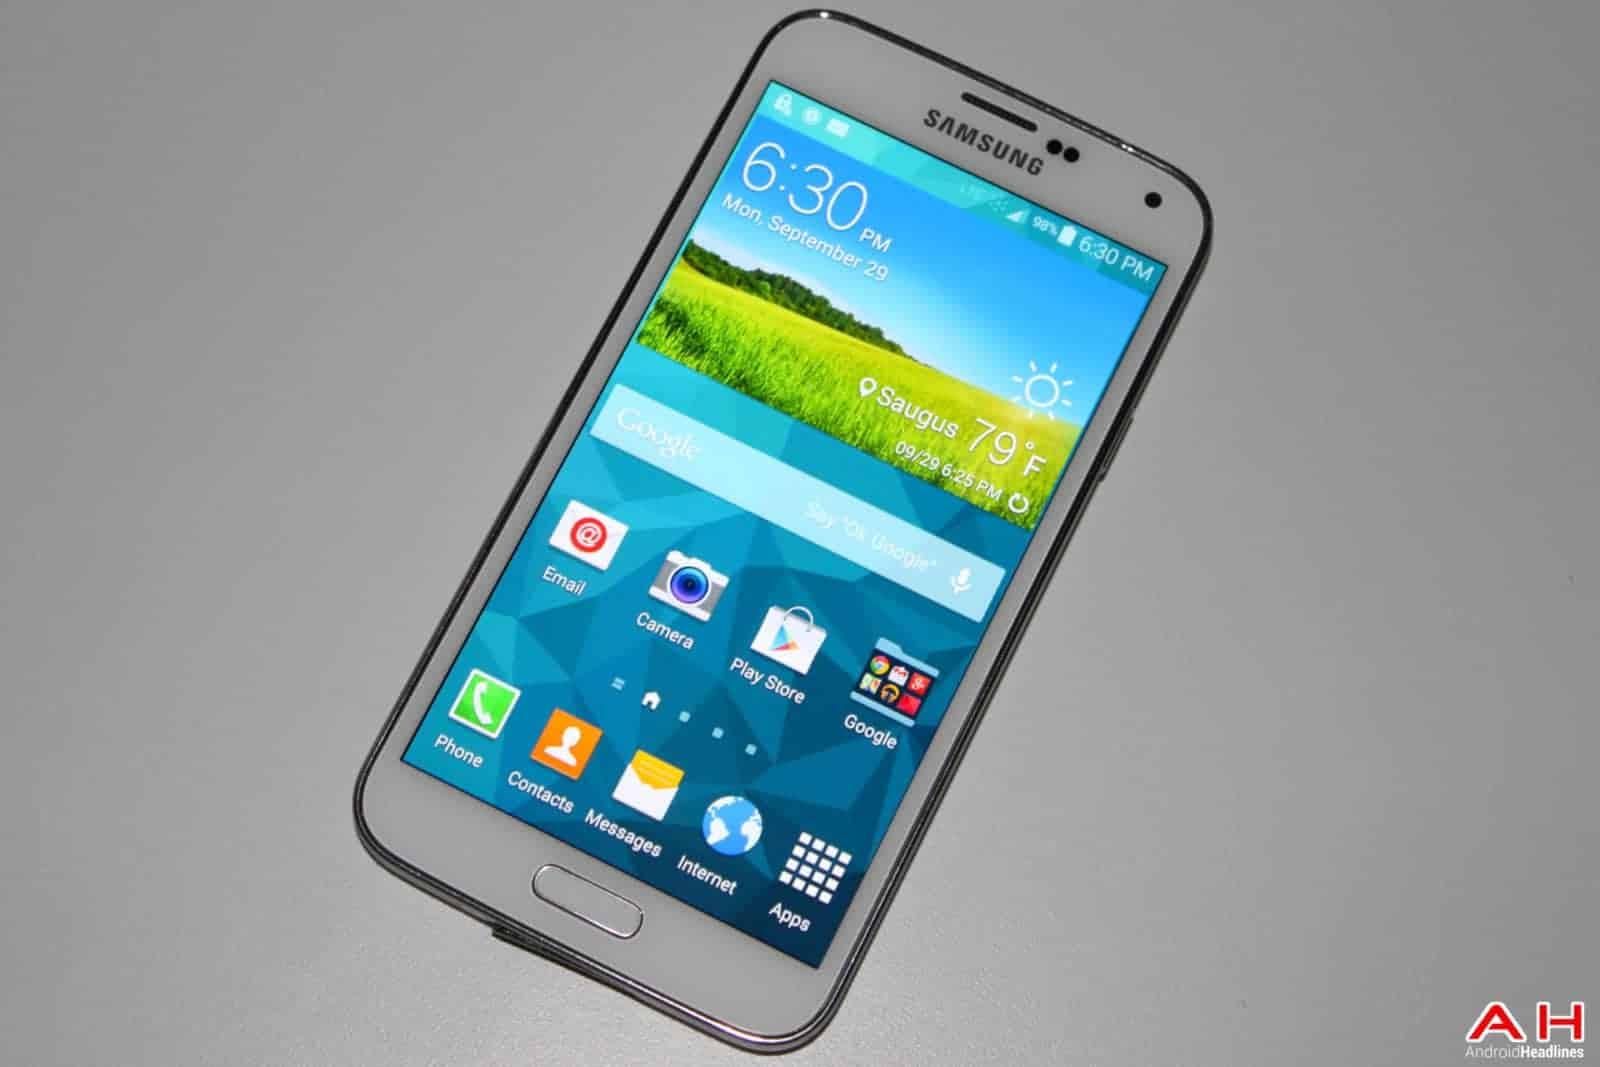 AH Samsung Galaxy S5 -11